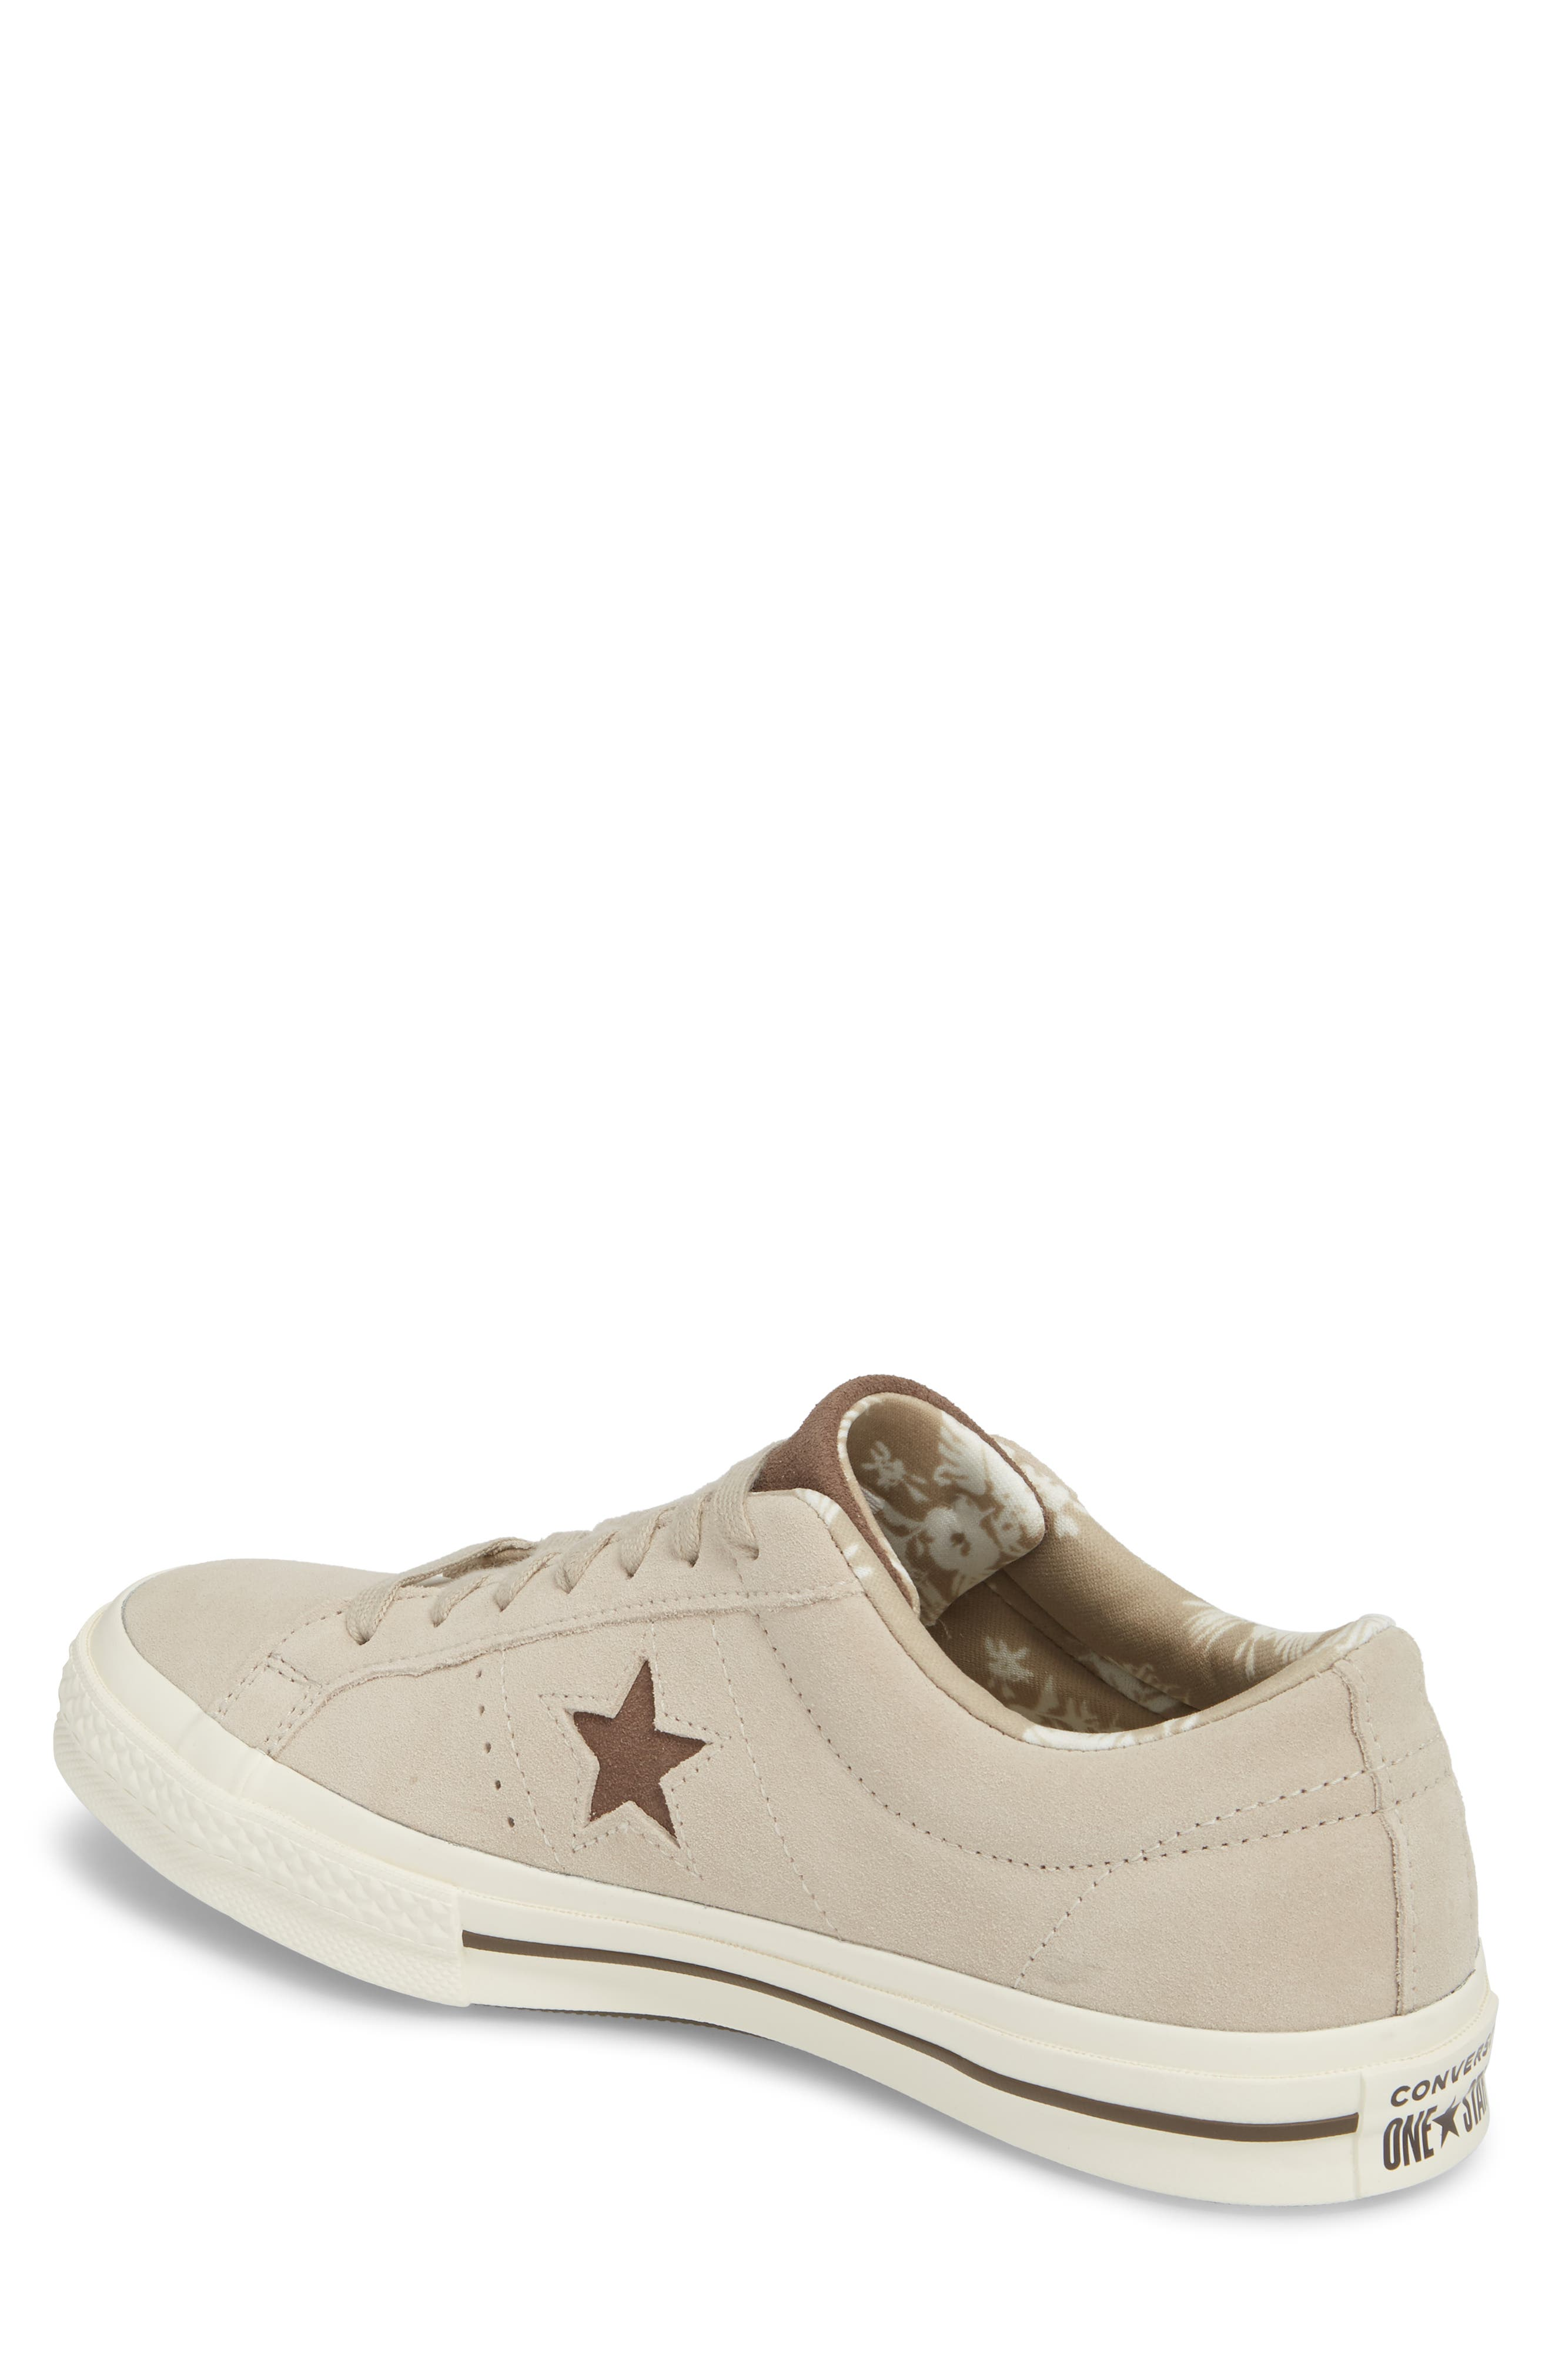 One-Star Tropical Sneaker,                             Alternate thumbnail 2, color,                             Khaki Suede